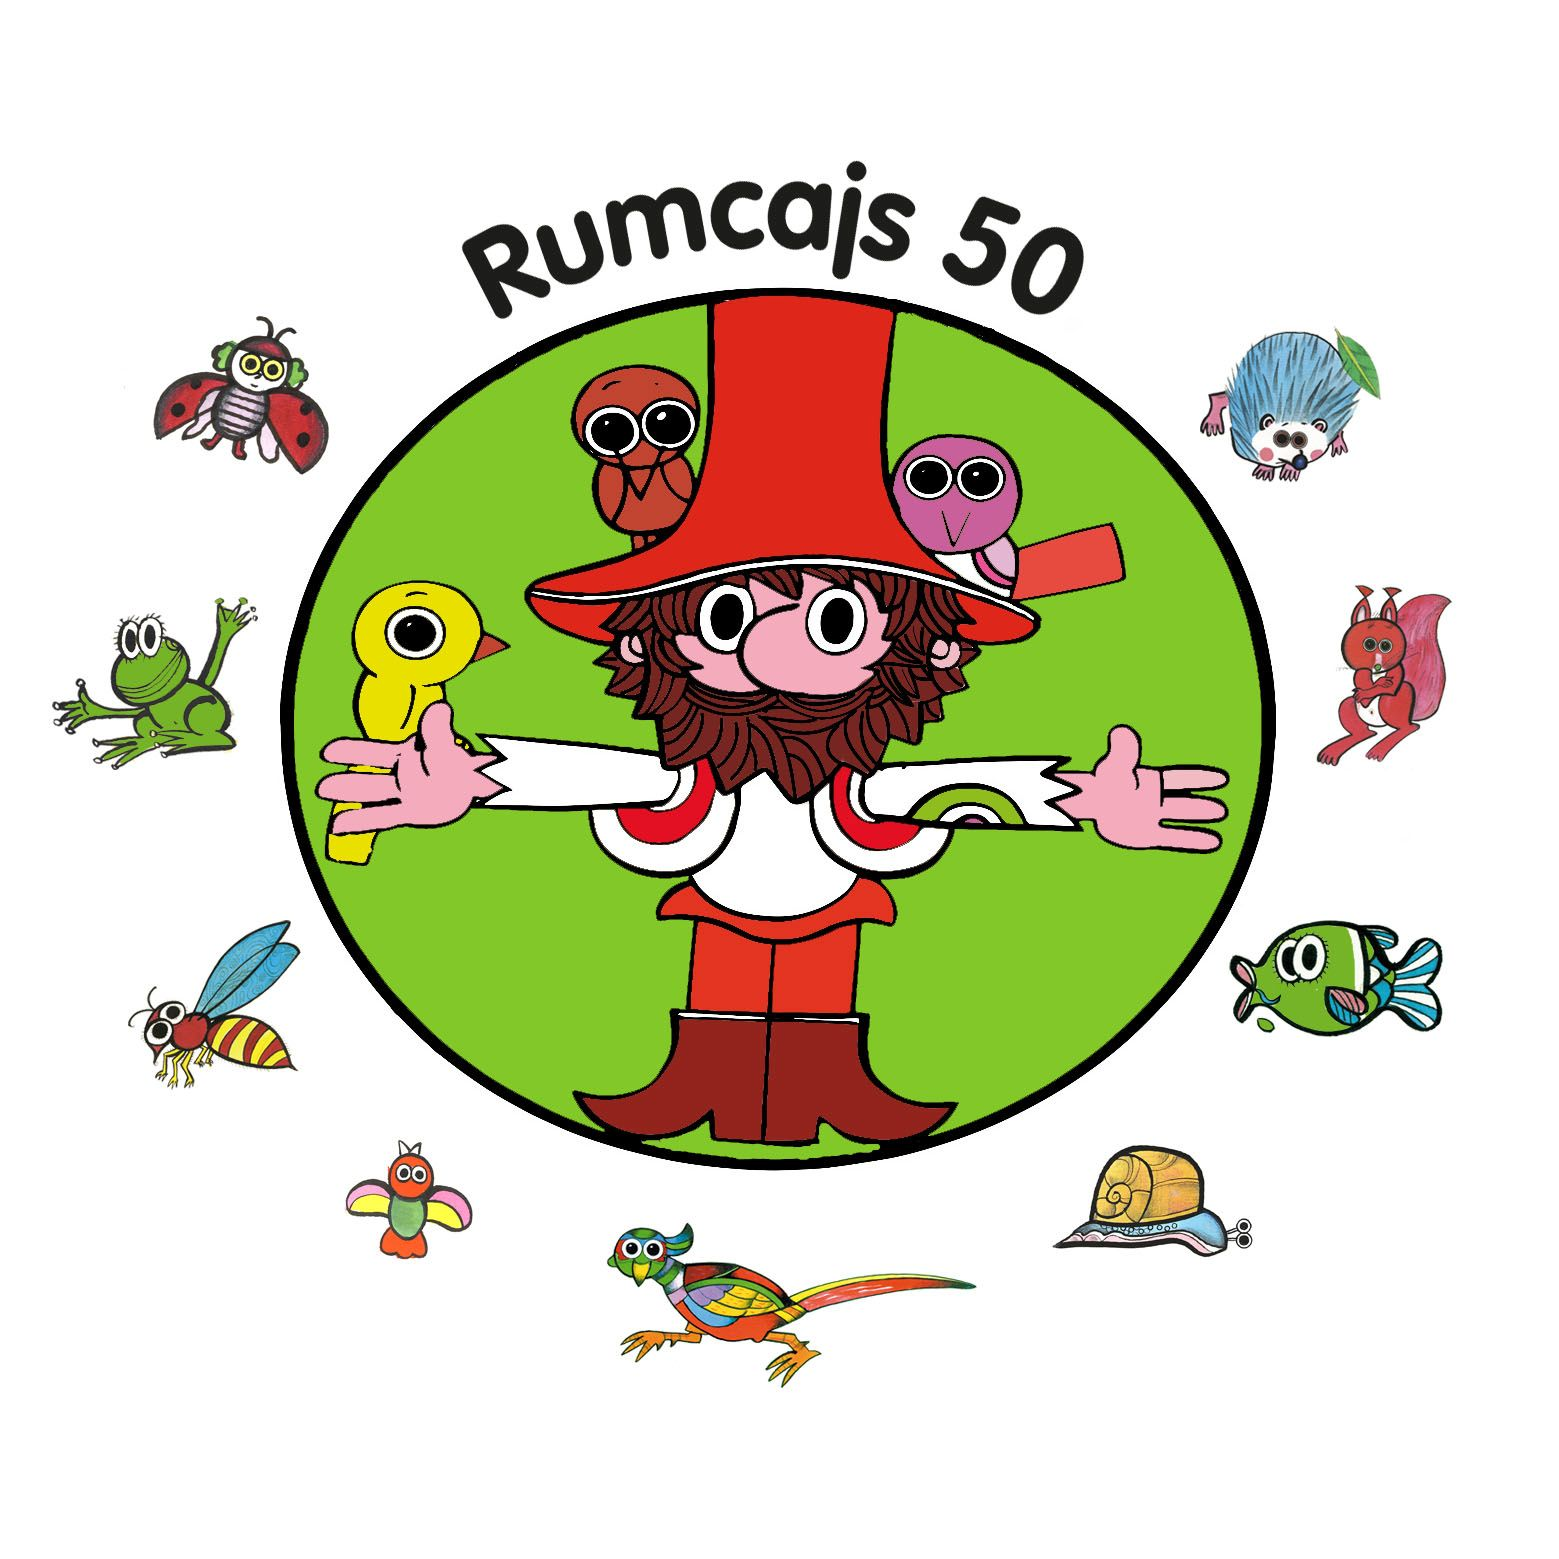 Rumcajs 50